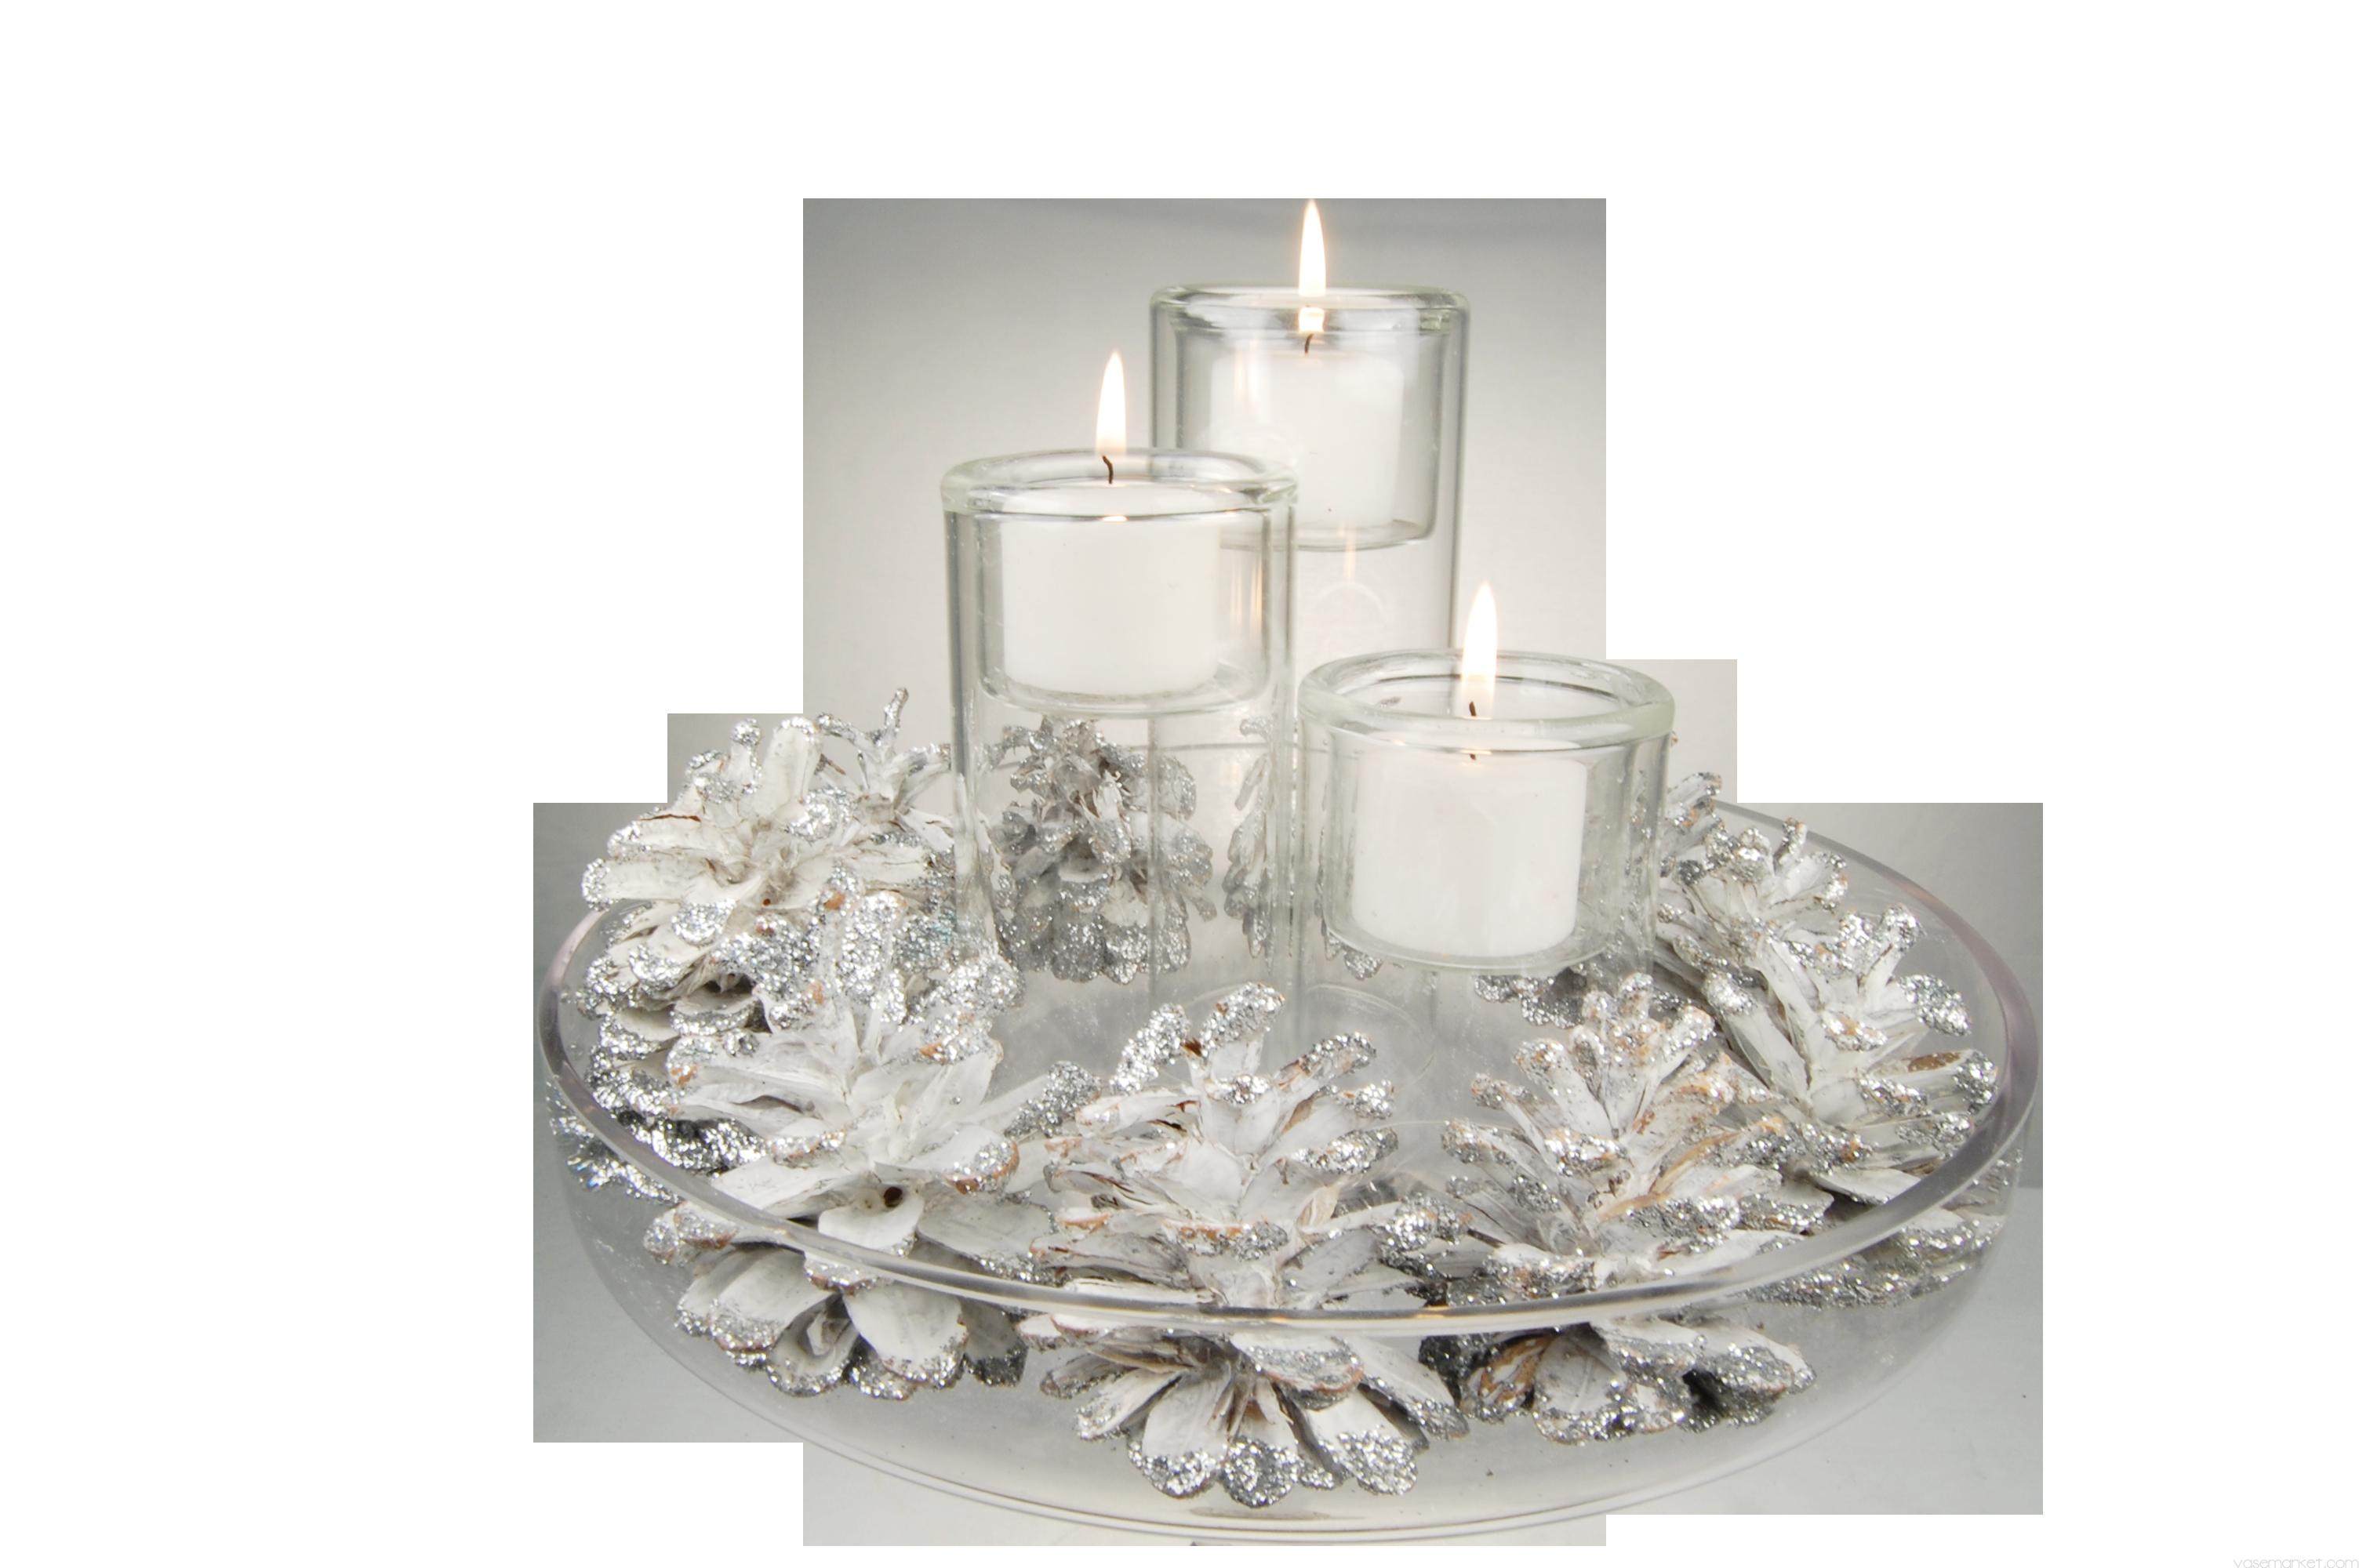 image transparent Transparent candle decorative. Cuddly candles manufacturers suppliers